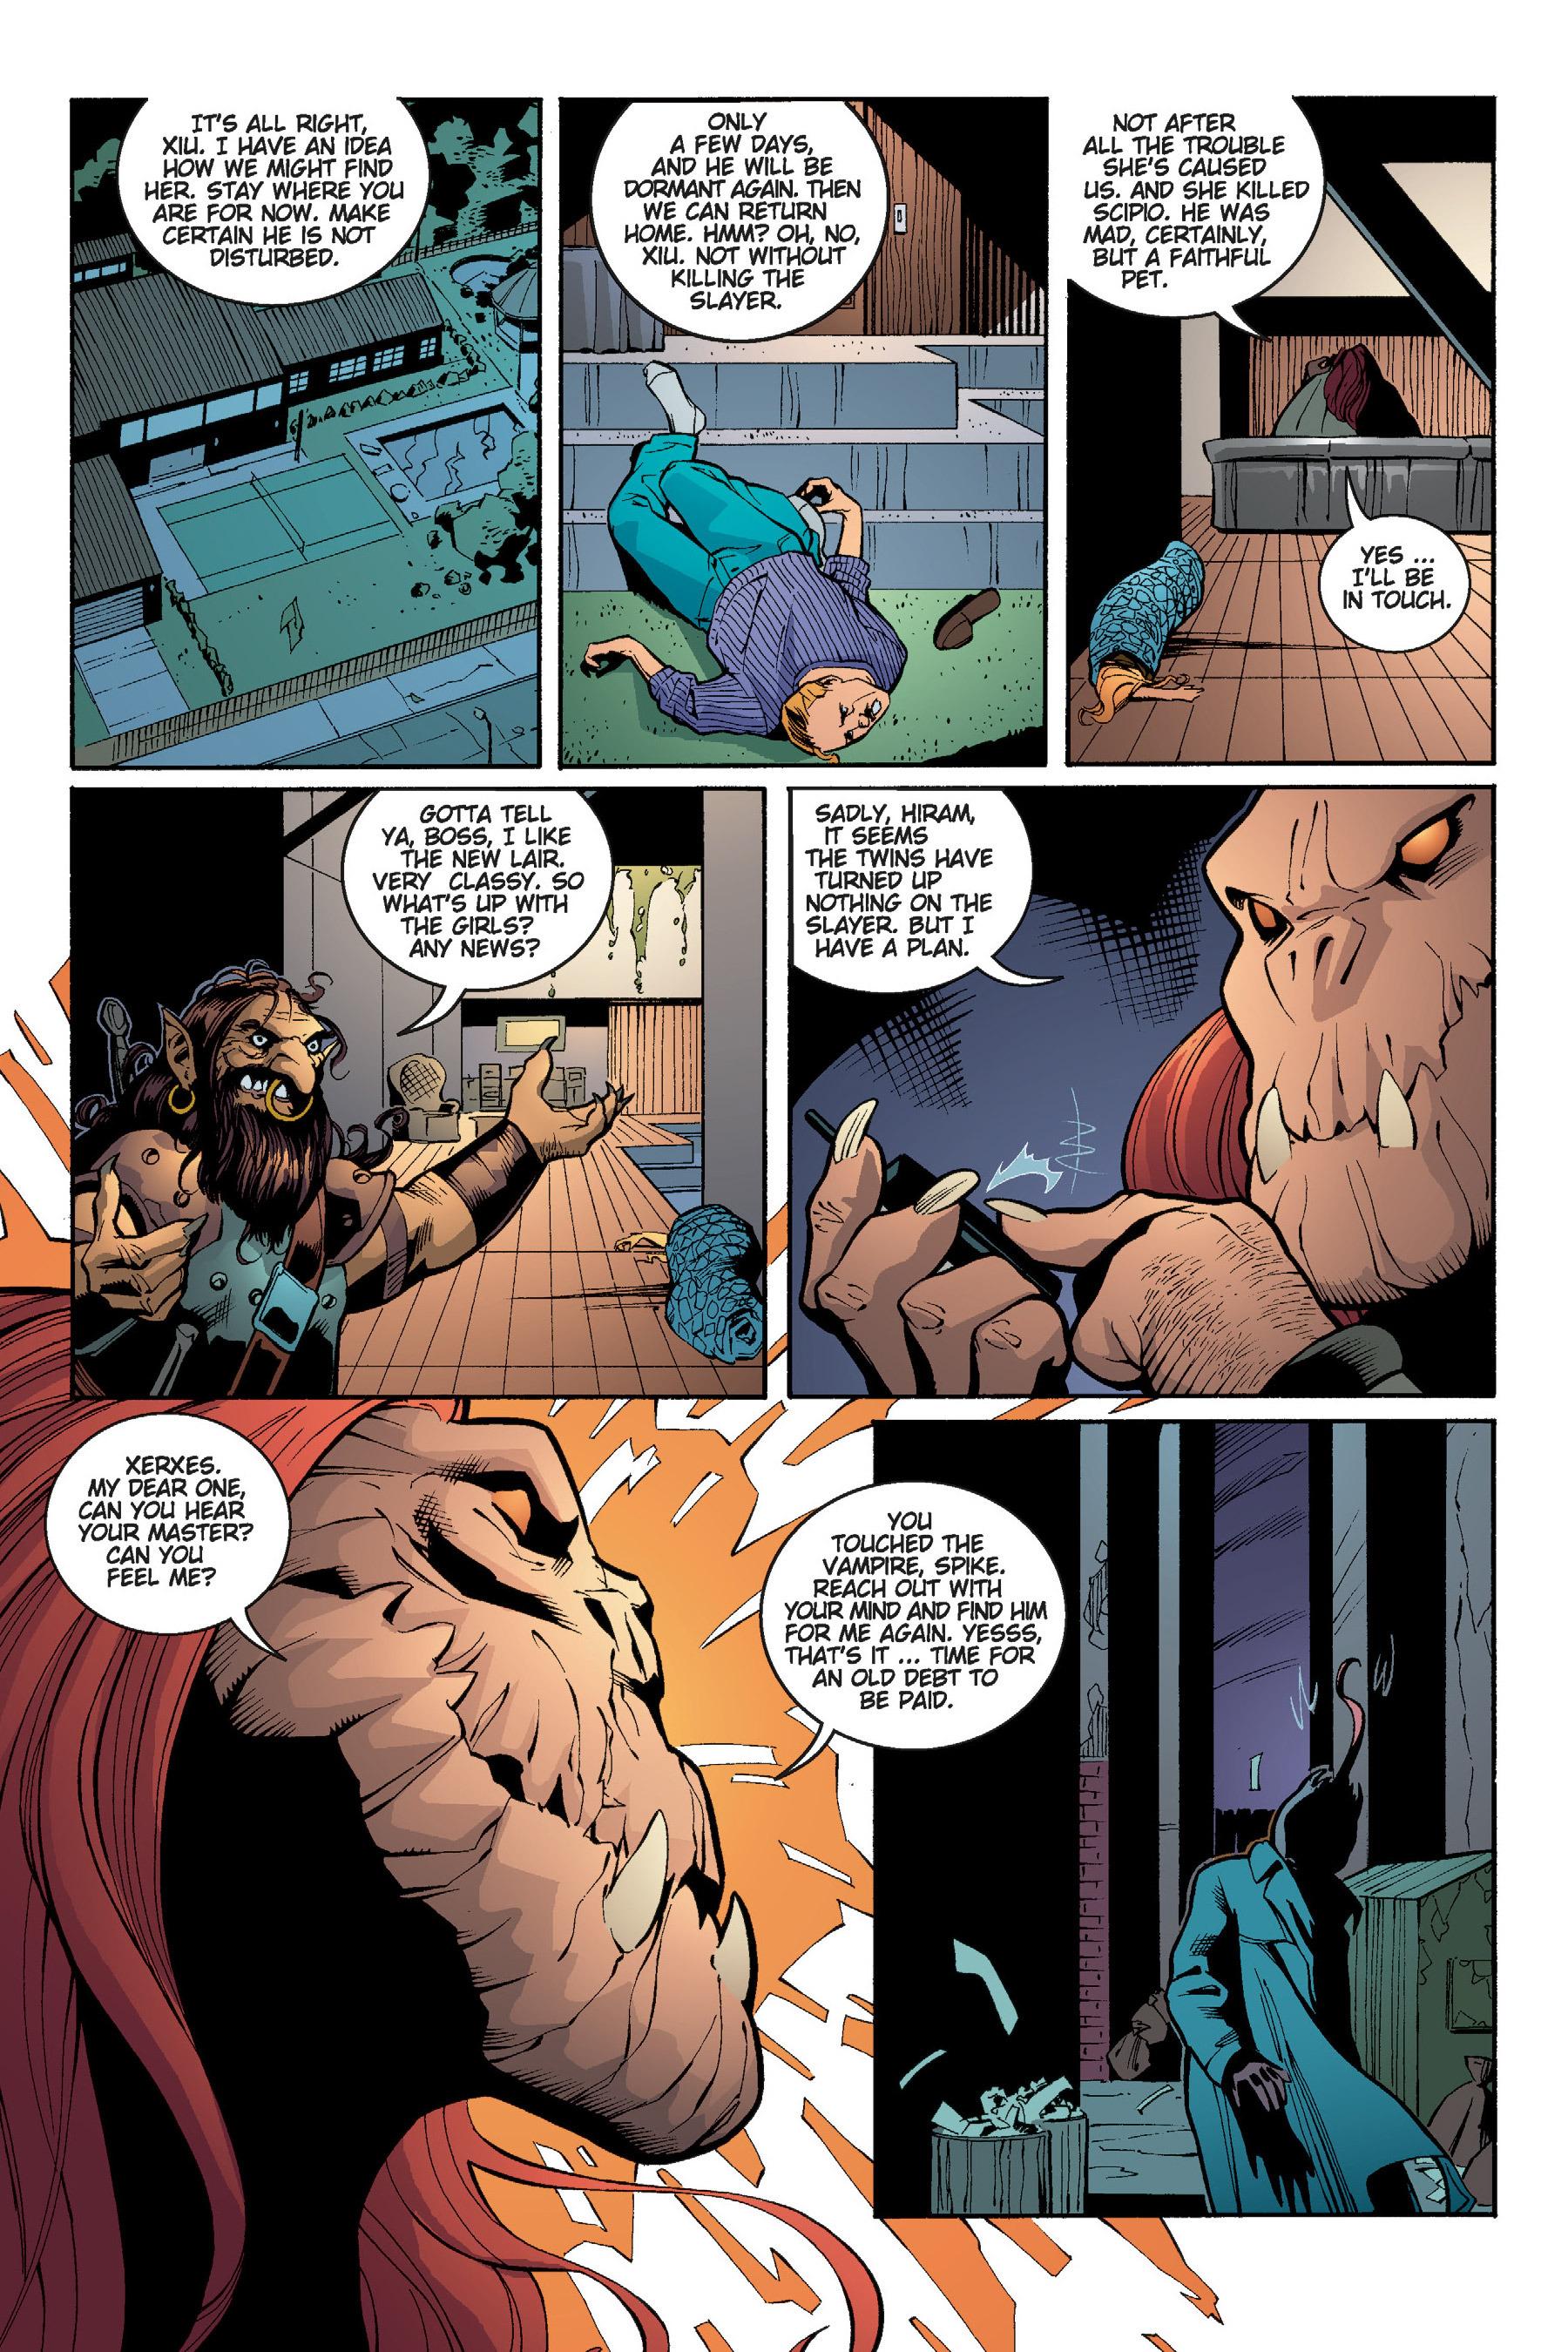 Read online Buffy the Vampire Slayer: Omnibus comic -  Issue # TPB 5 - 166